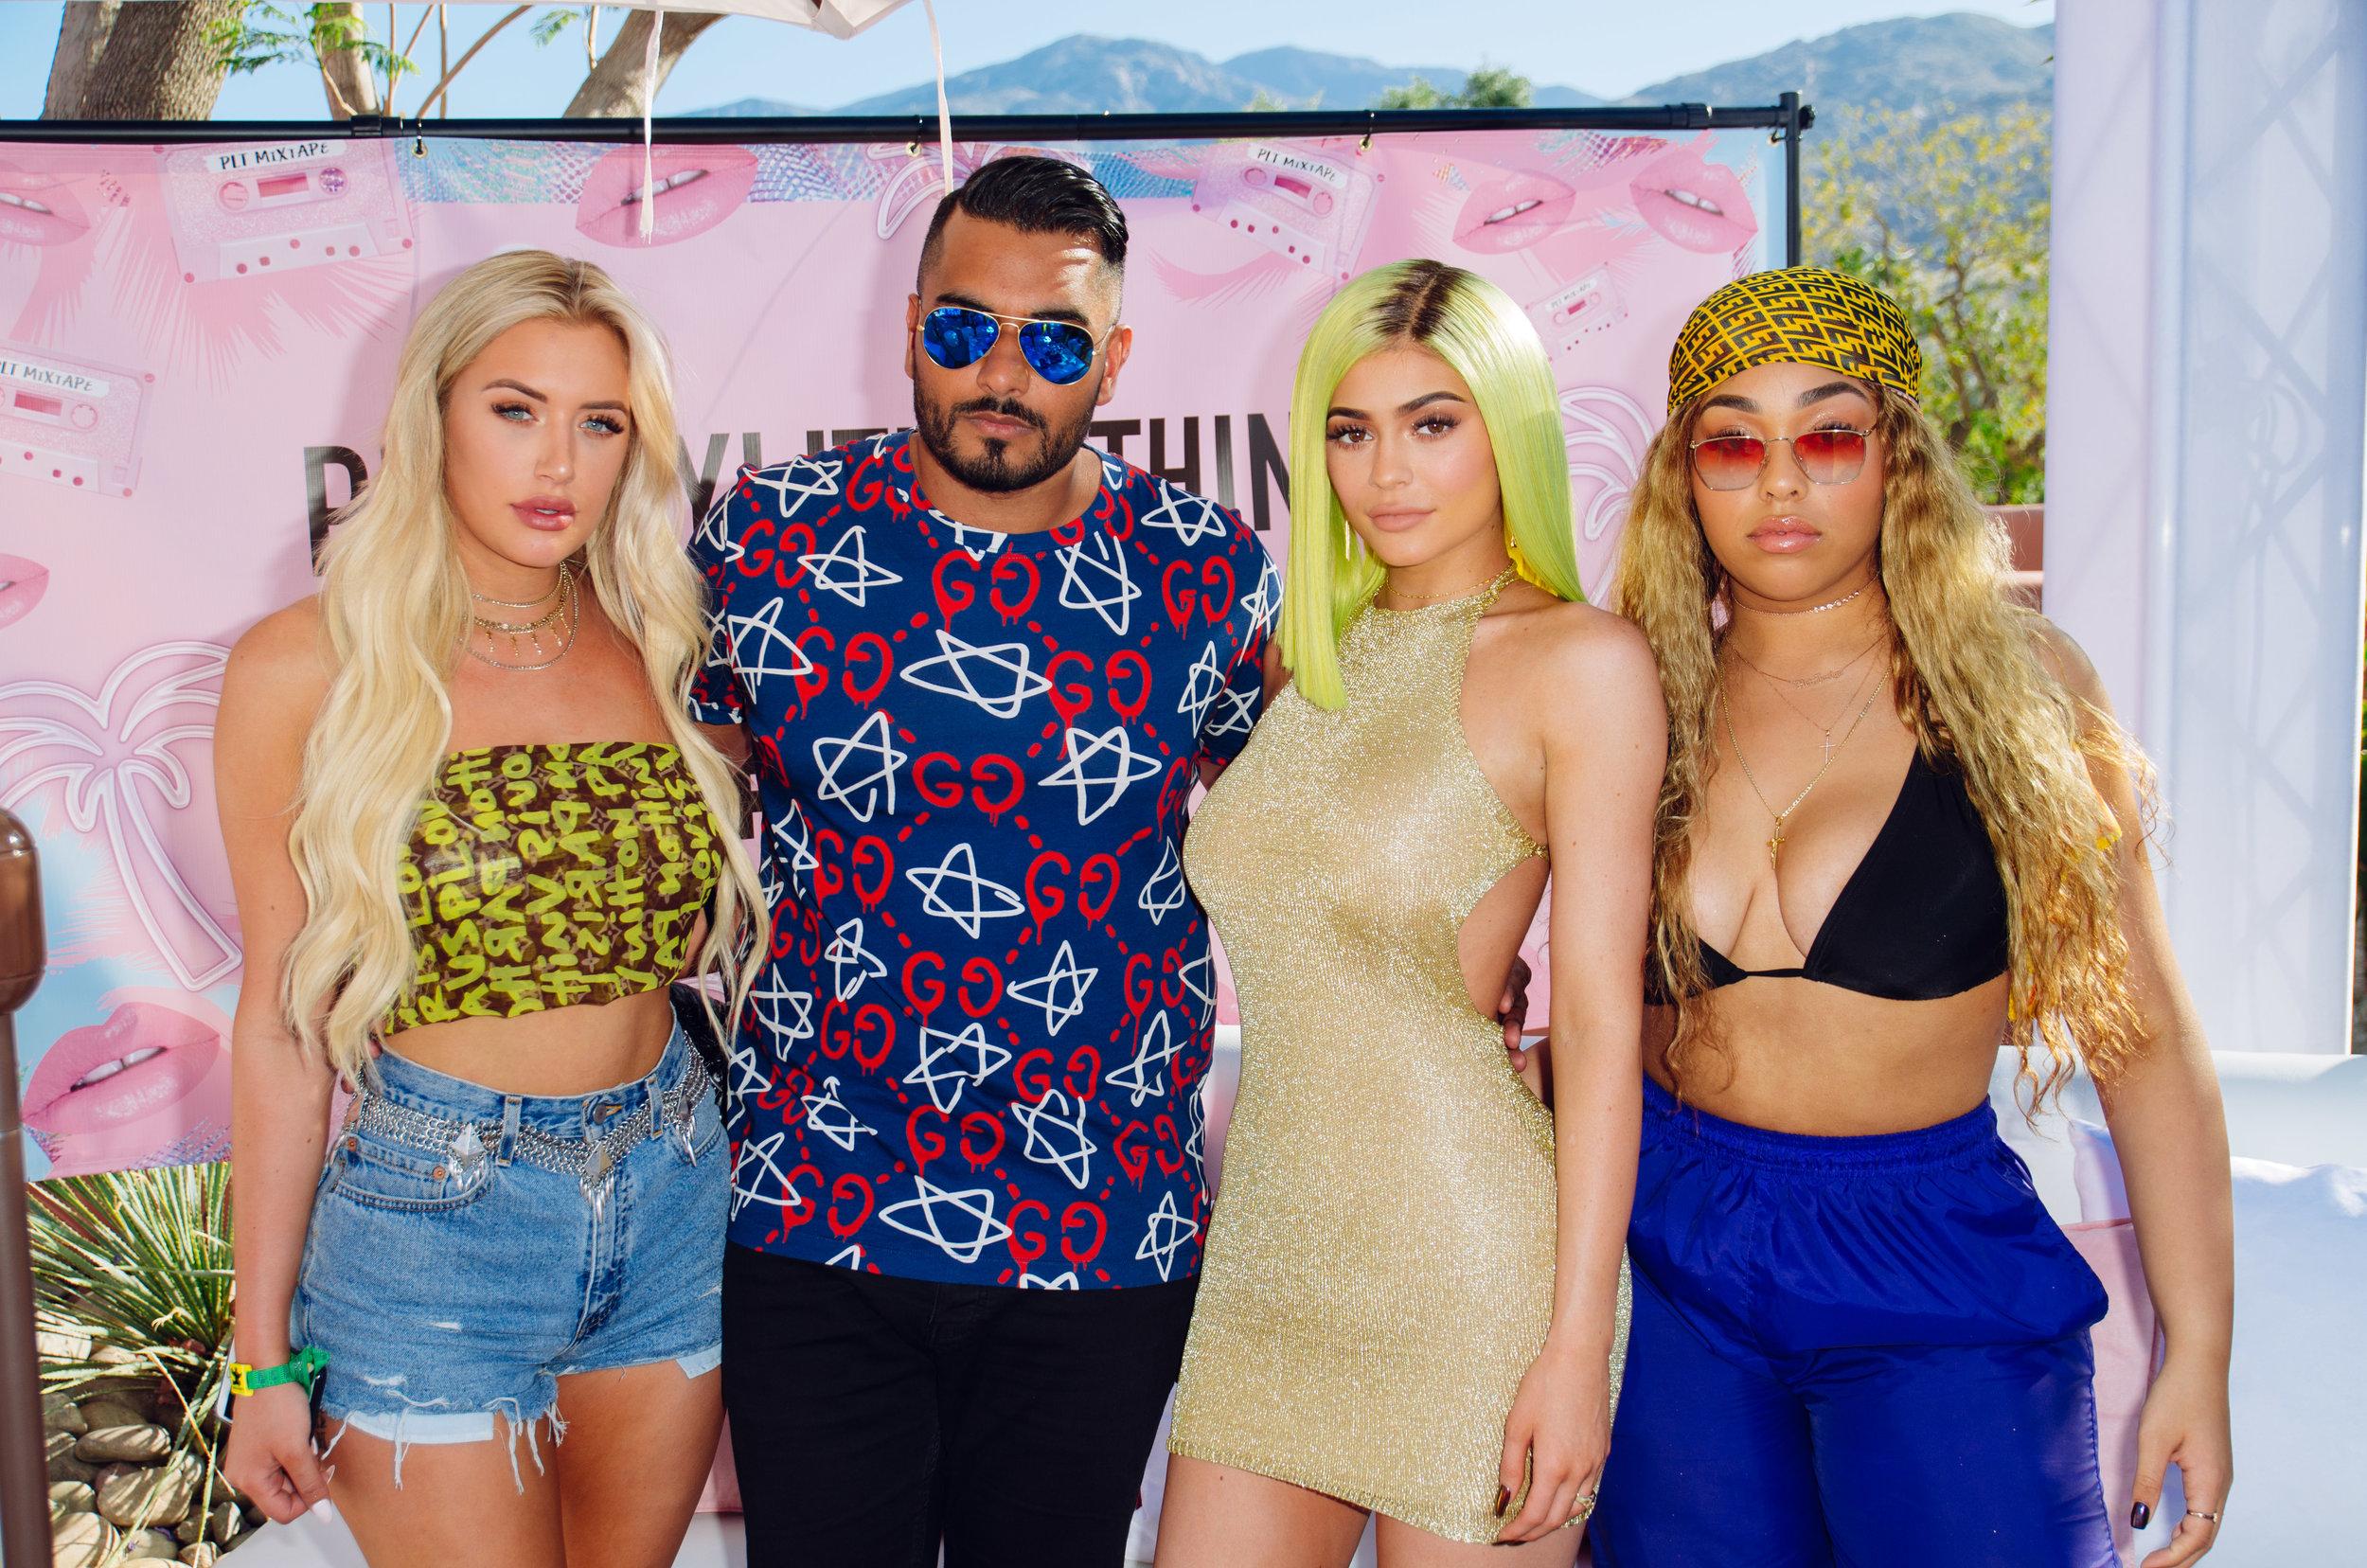 Ultimate Hollywood Coachella Poolside Party umar kumani stassie kylie jenner.jpg